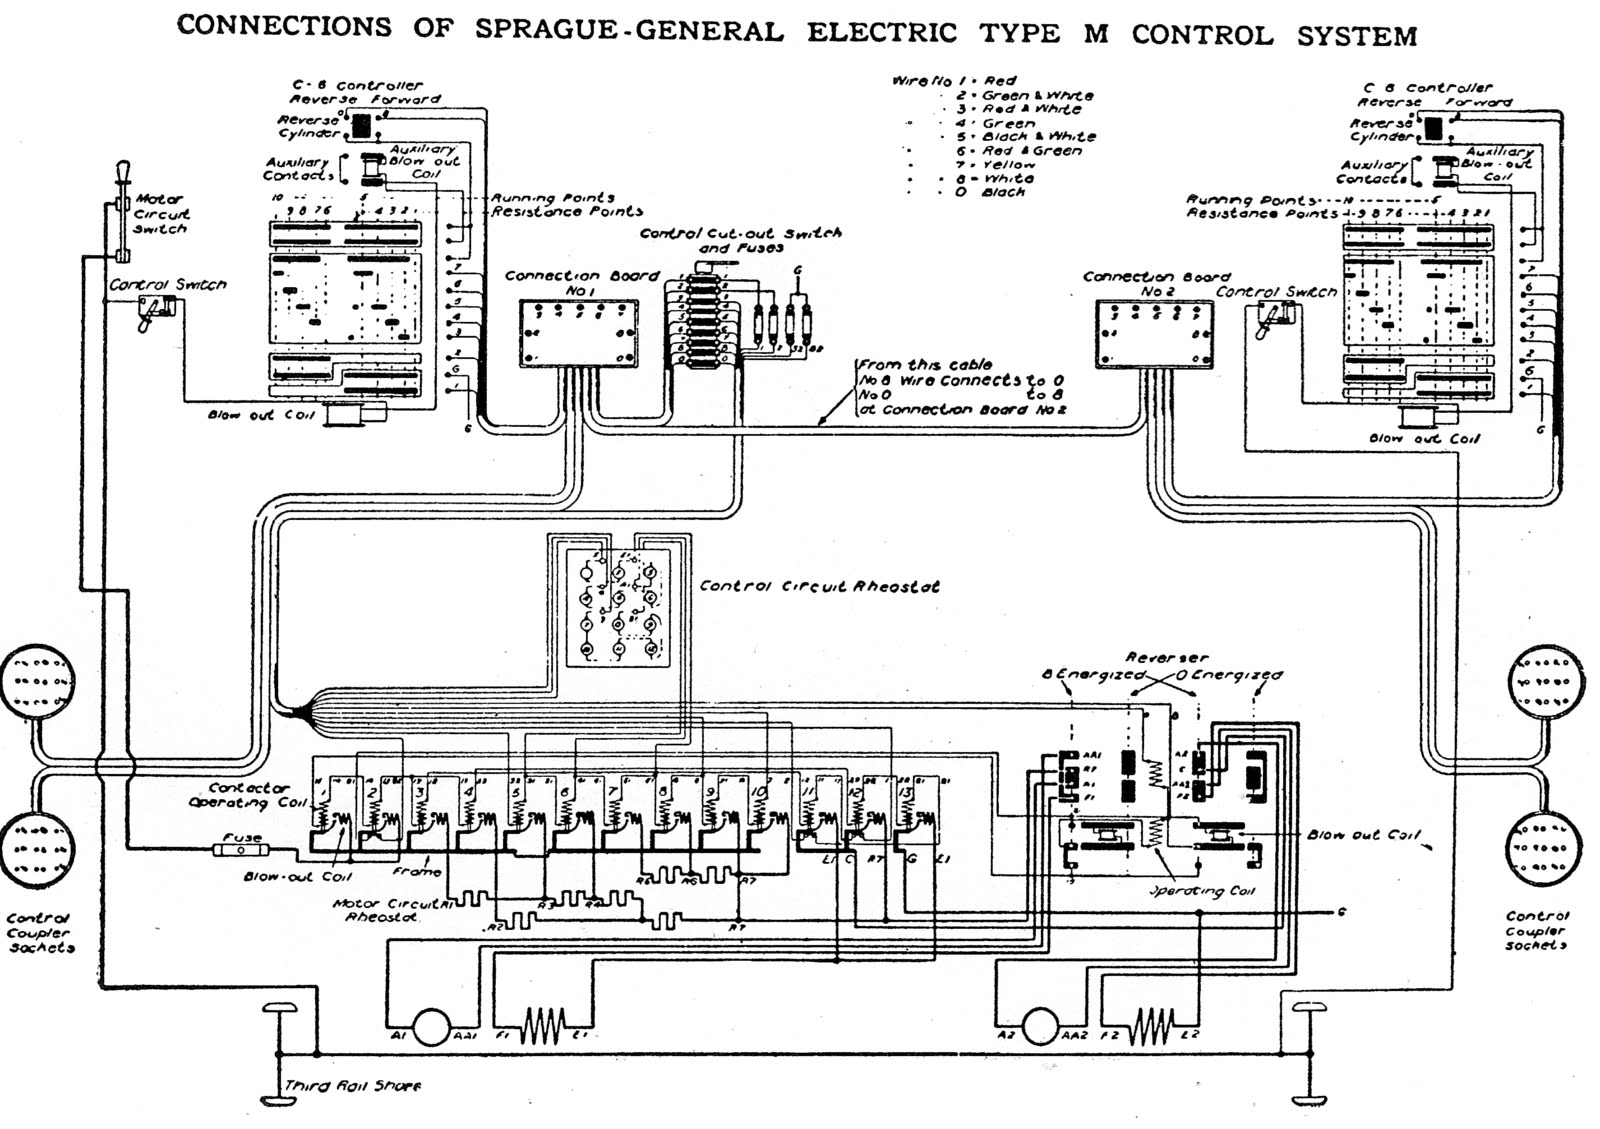 1990 honda accord antenna wiring diagram 2003 Honda Accord Radio Wiring 1997 Honda Accord Wiring Diagram